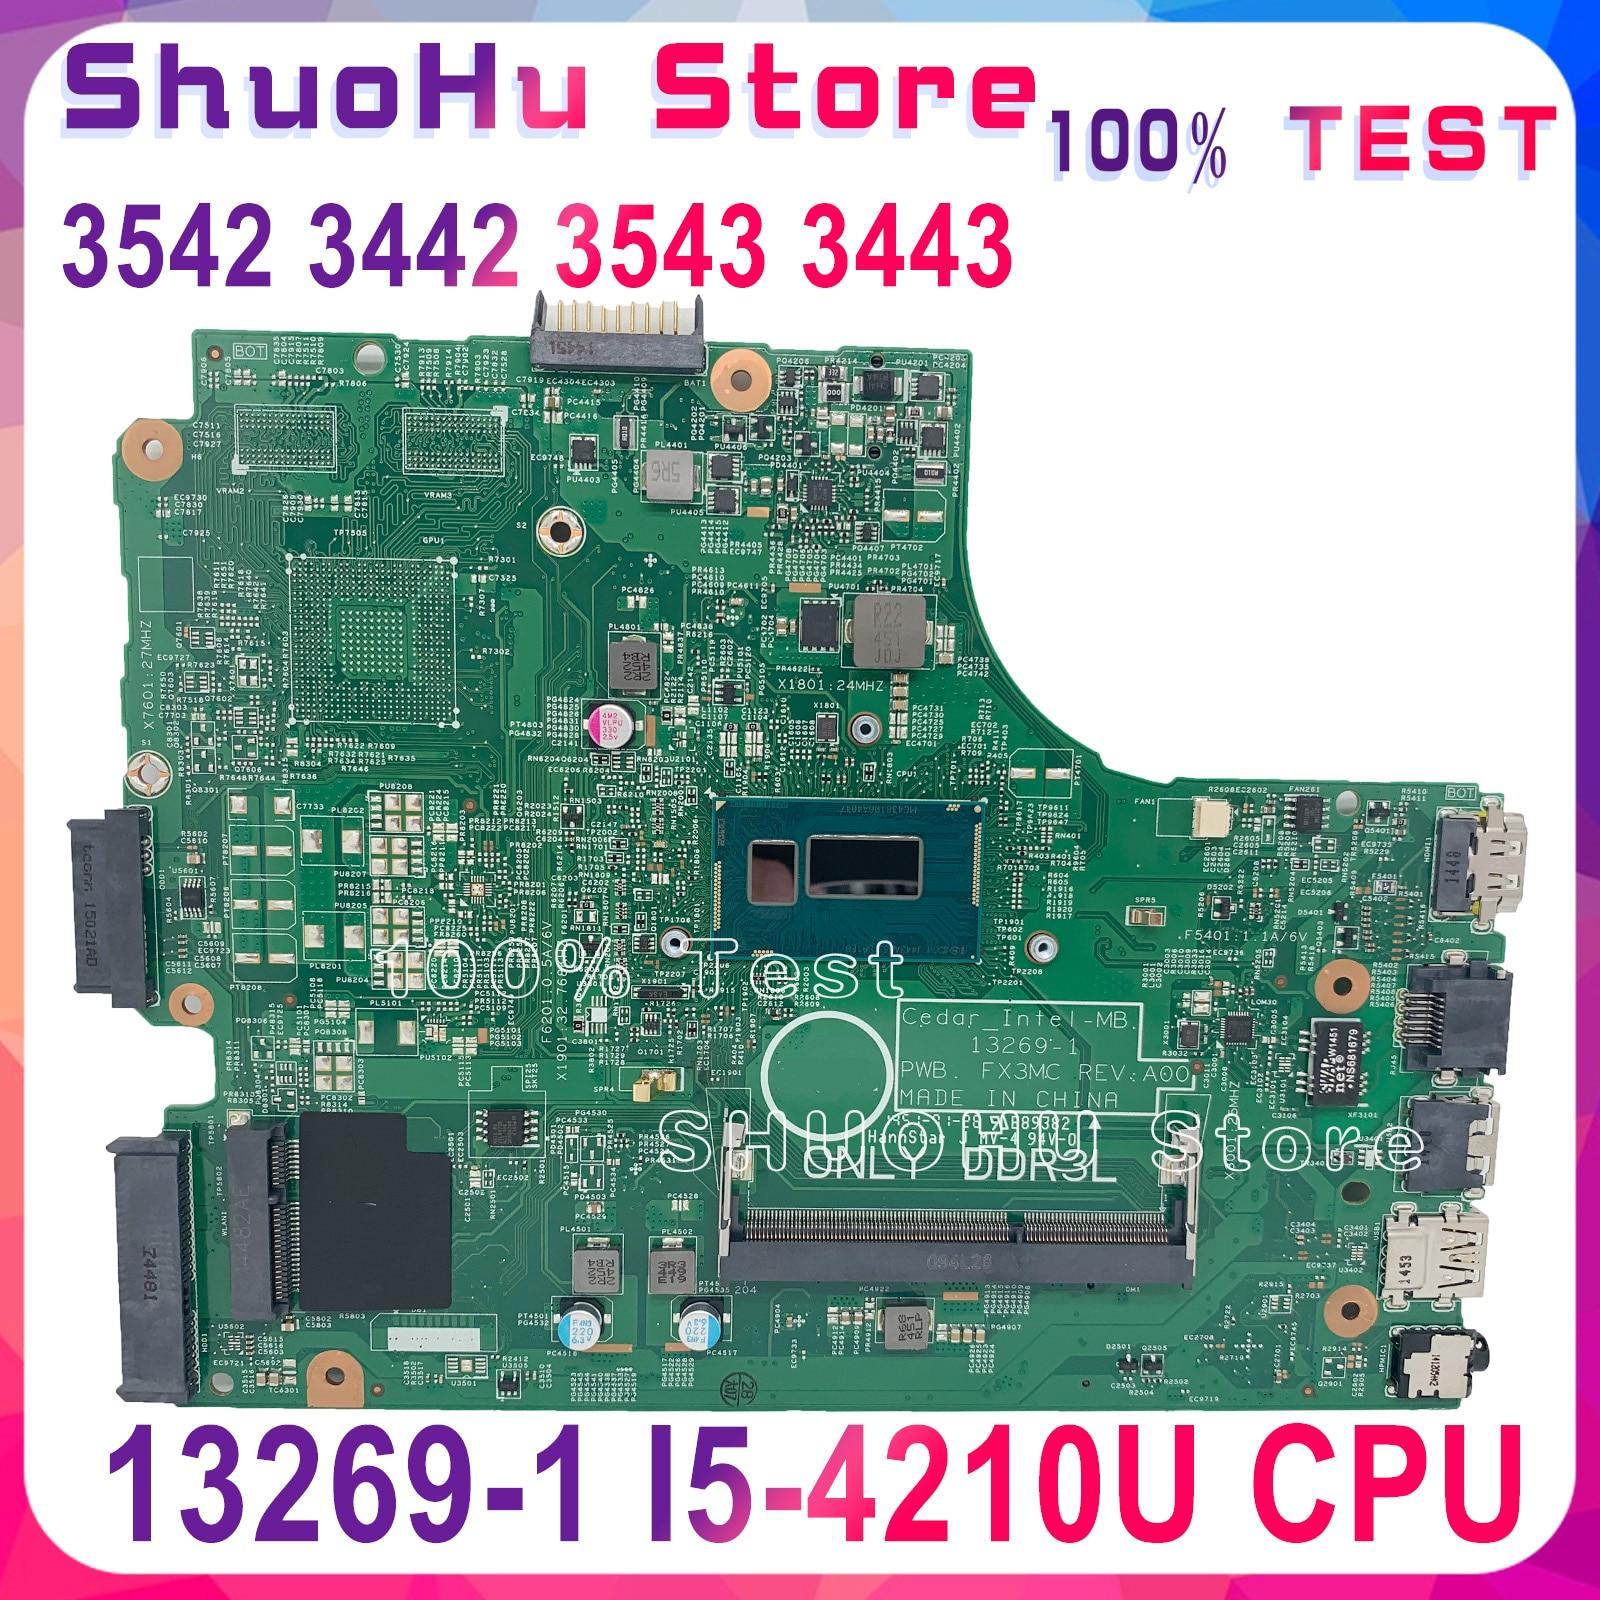 KEFU 13269-1 Para DELL inspiron 3542 3543 3443 3542 3442 Motherboard 13269-1 PWB FX3MC A00 REV Motherboard I5-4210U original